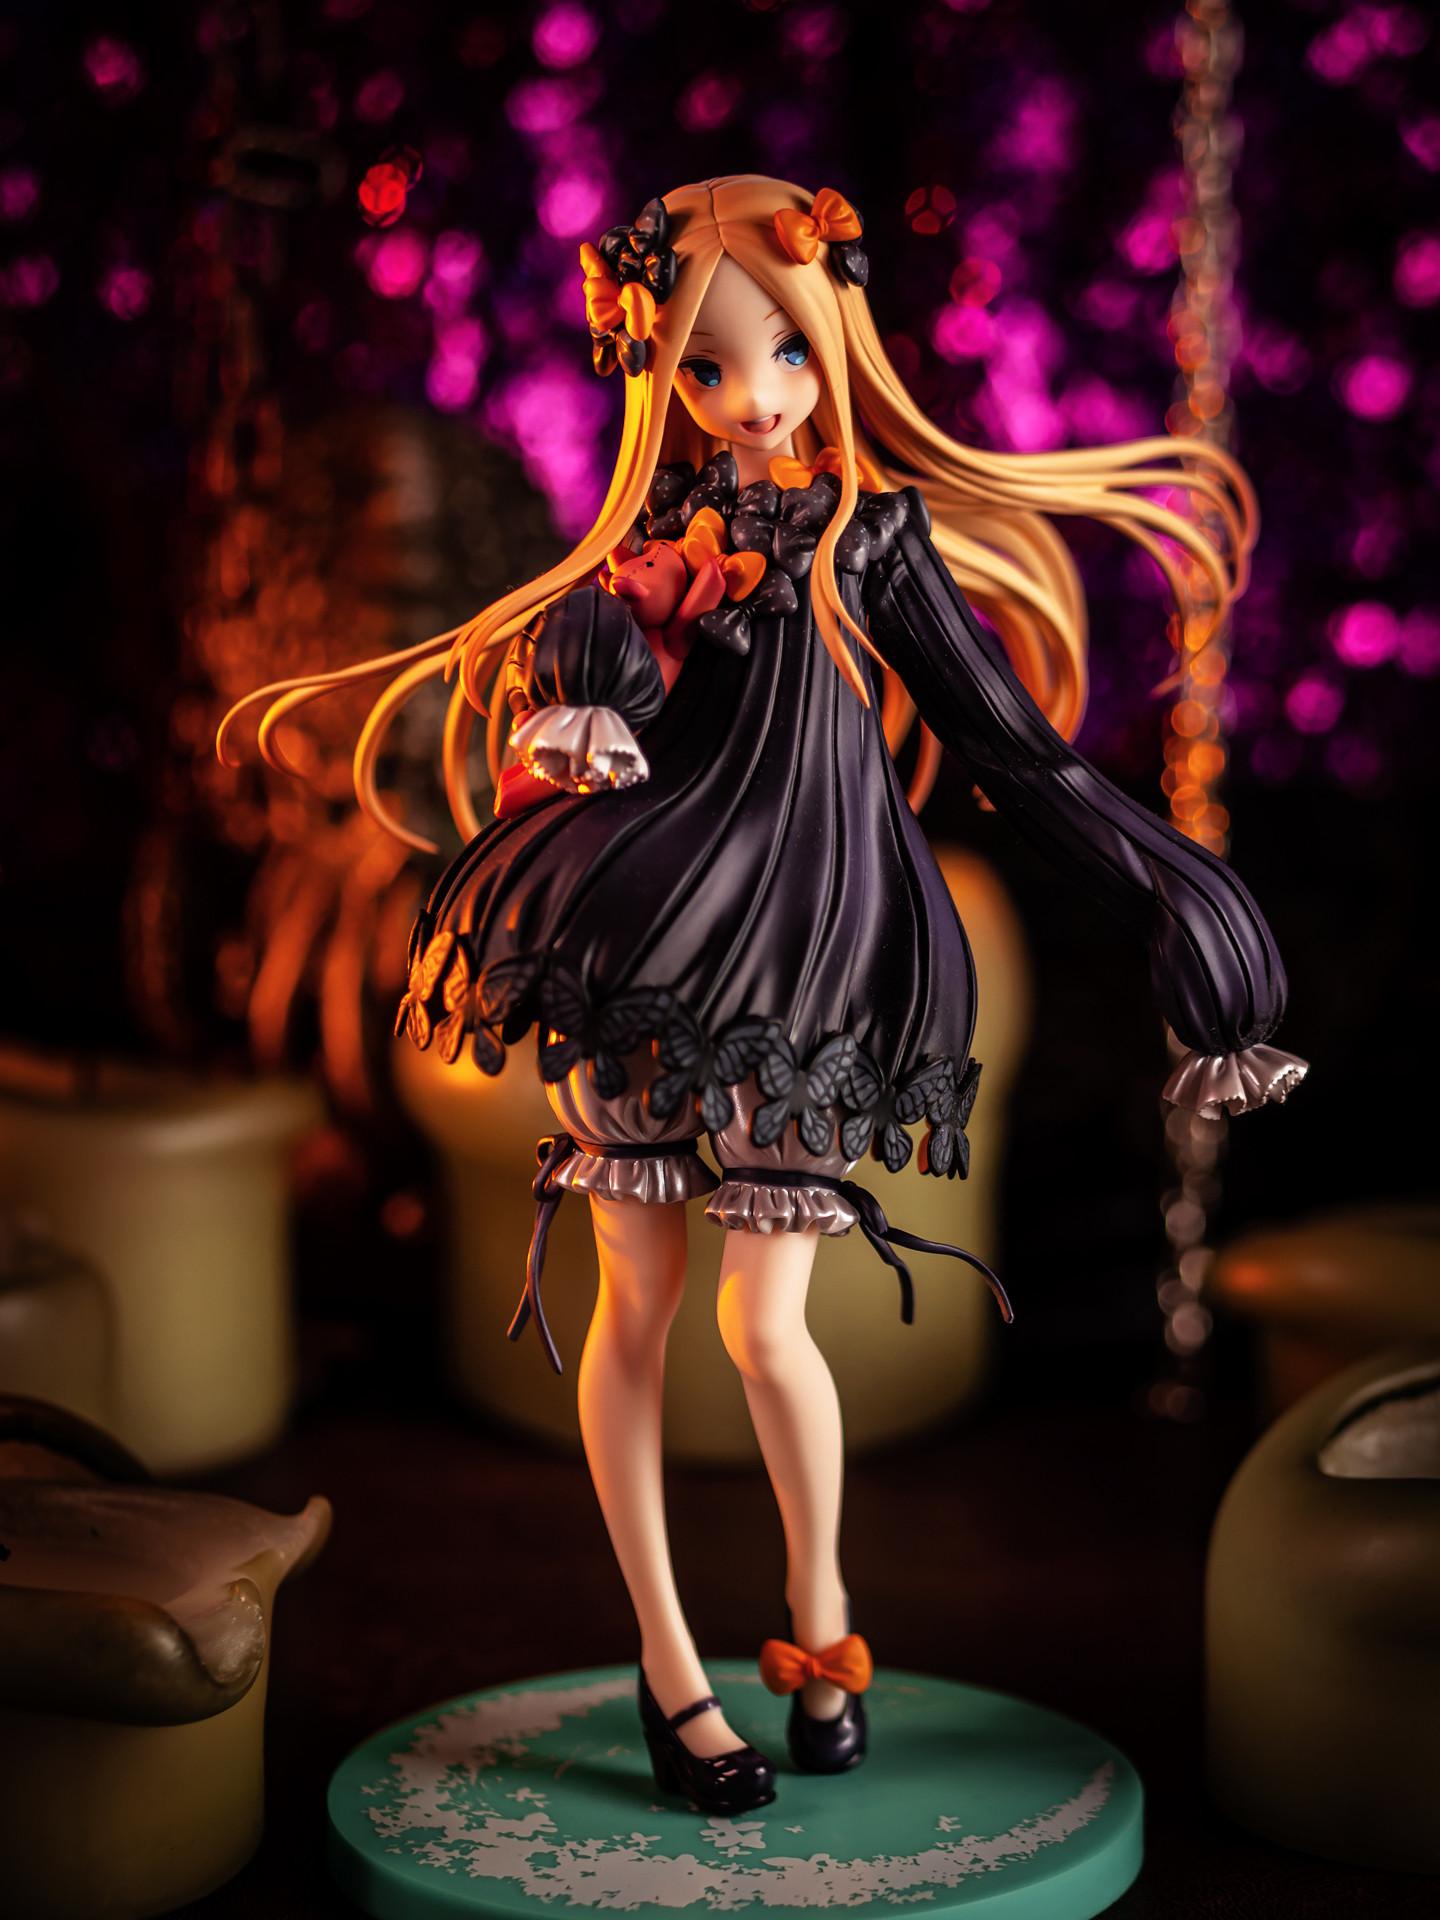 Fate/Grand Order - Abigail Williams - 001.jpg